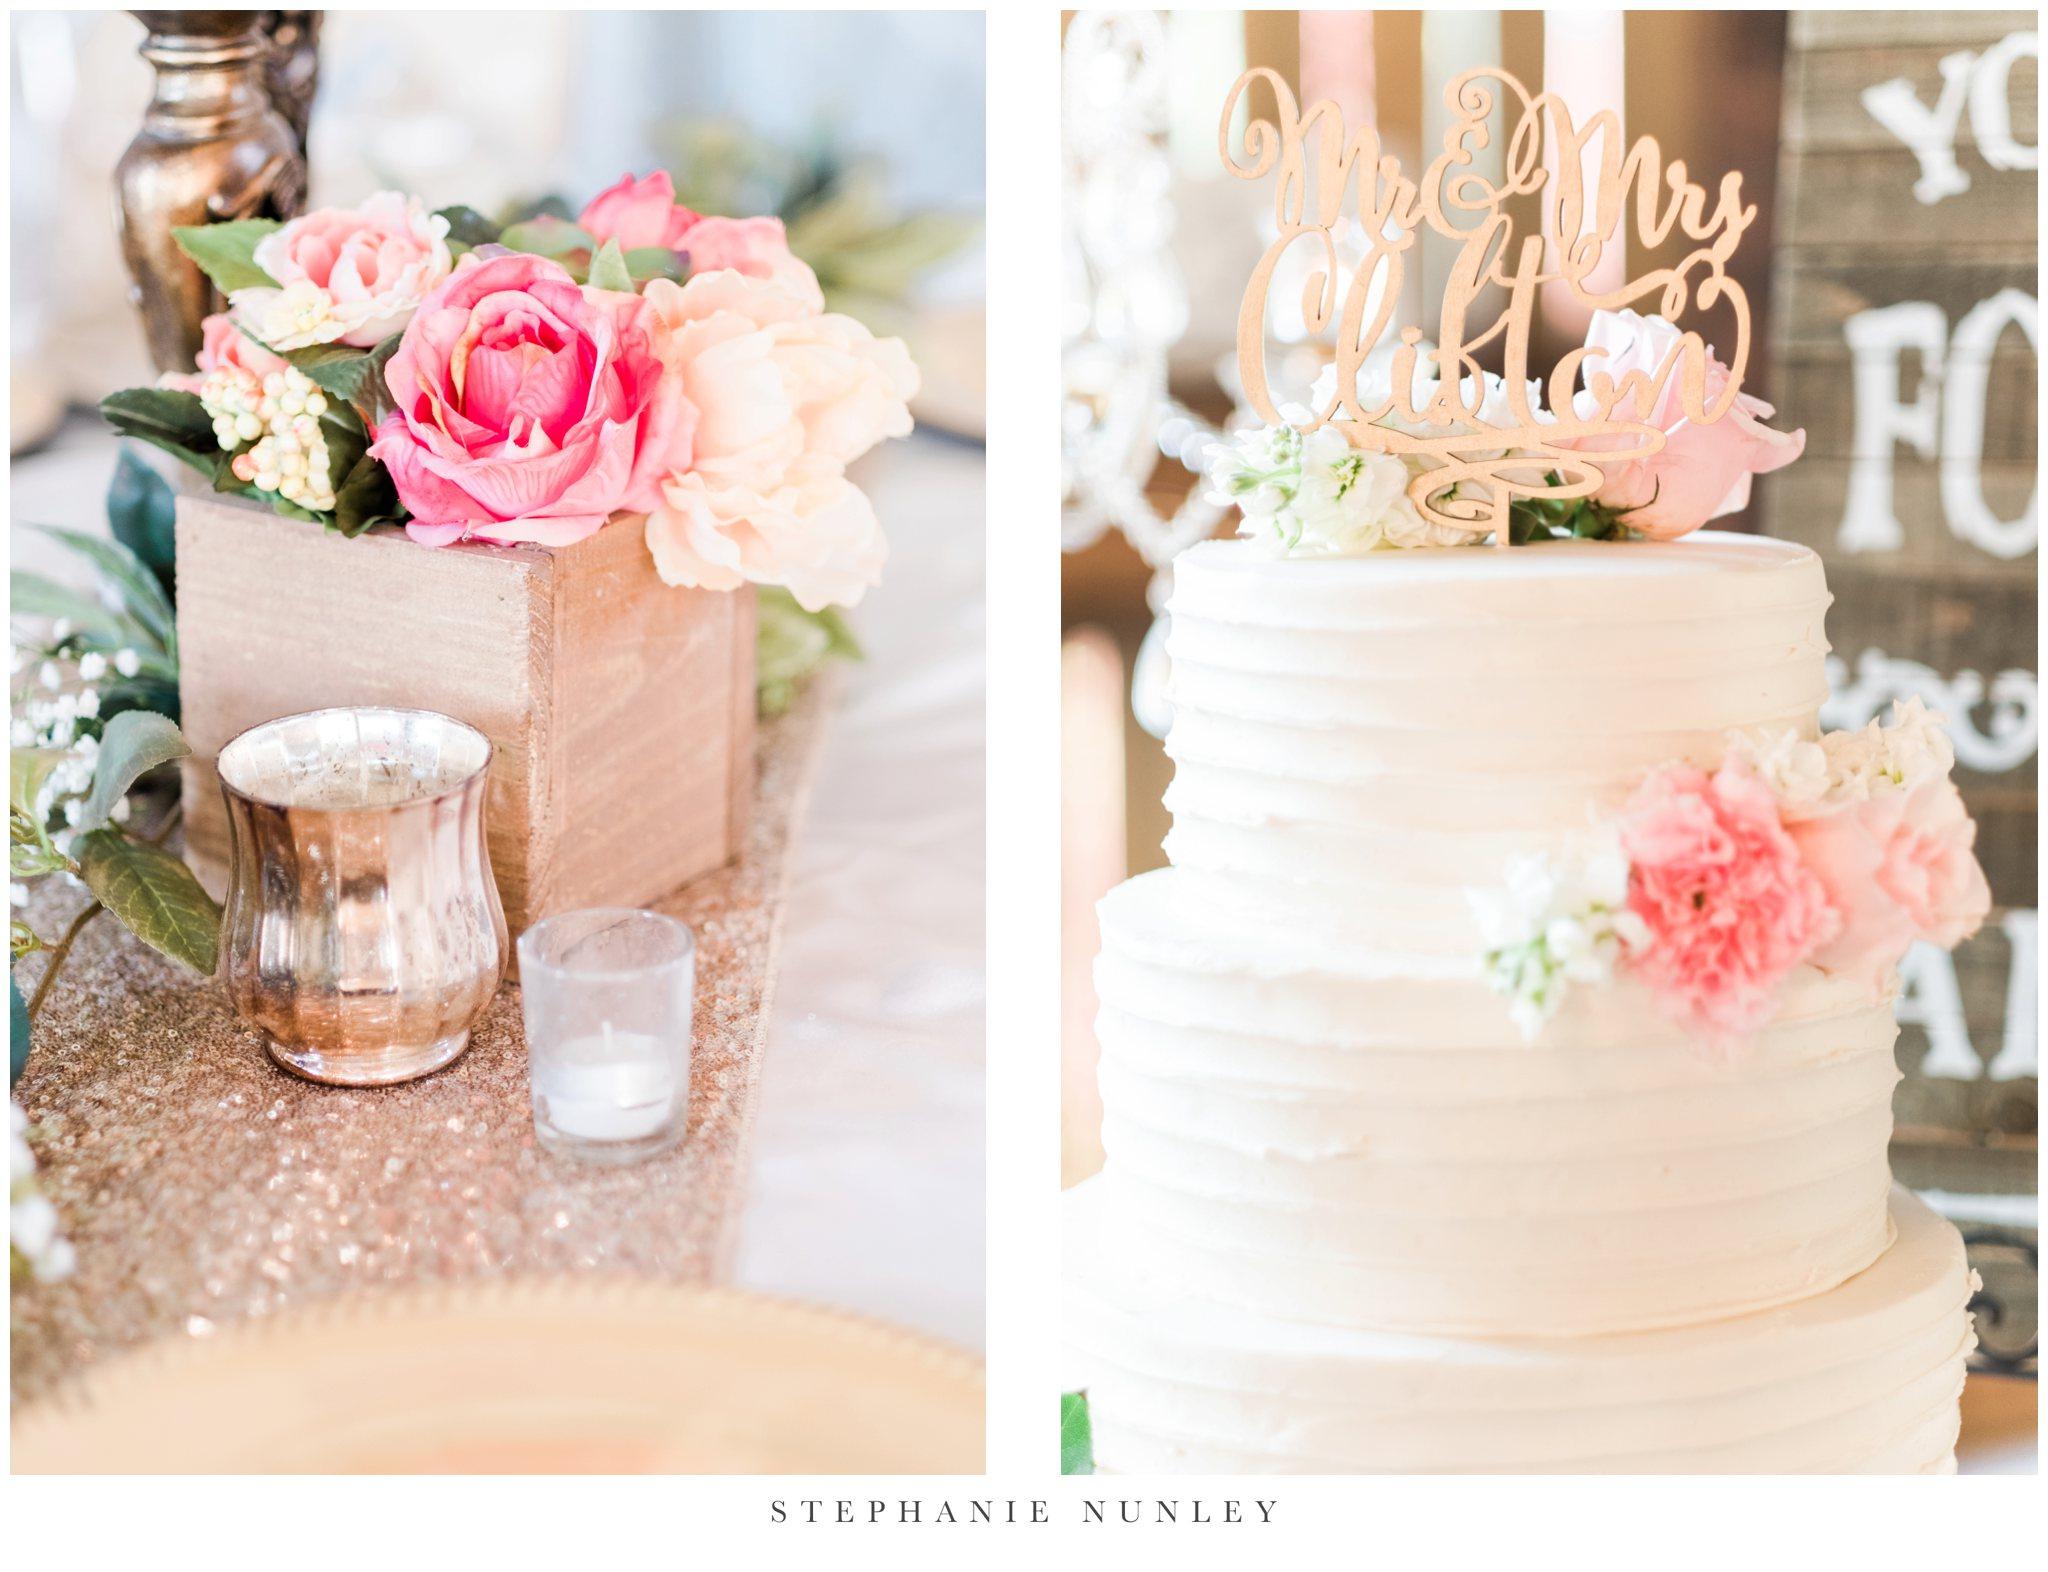 romantic-outdoor-wedding-with-flower-crown-0119.jpg